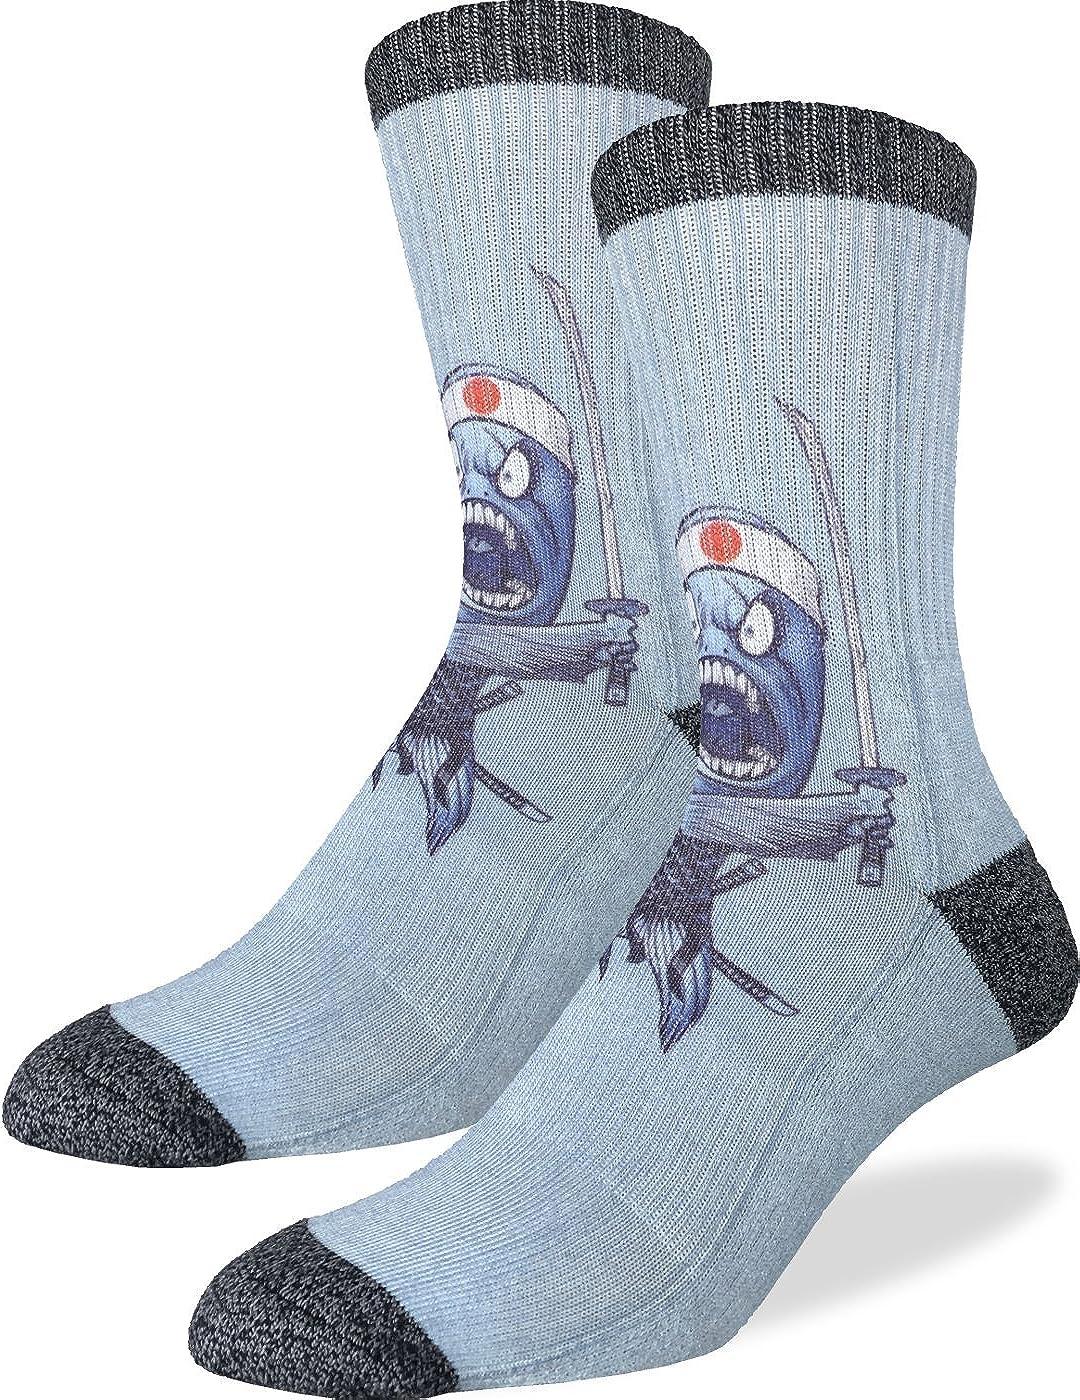 Good Luck Sock Men's Samurai Sushi Fish Crew Socks, Shoe size 8-13, Blue